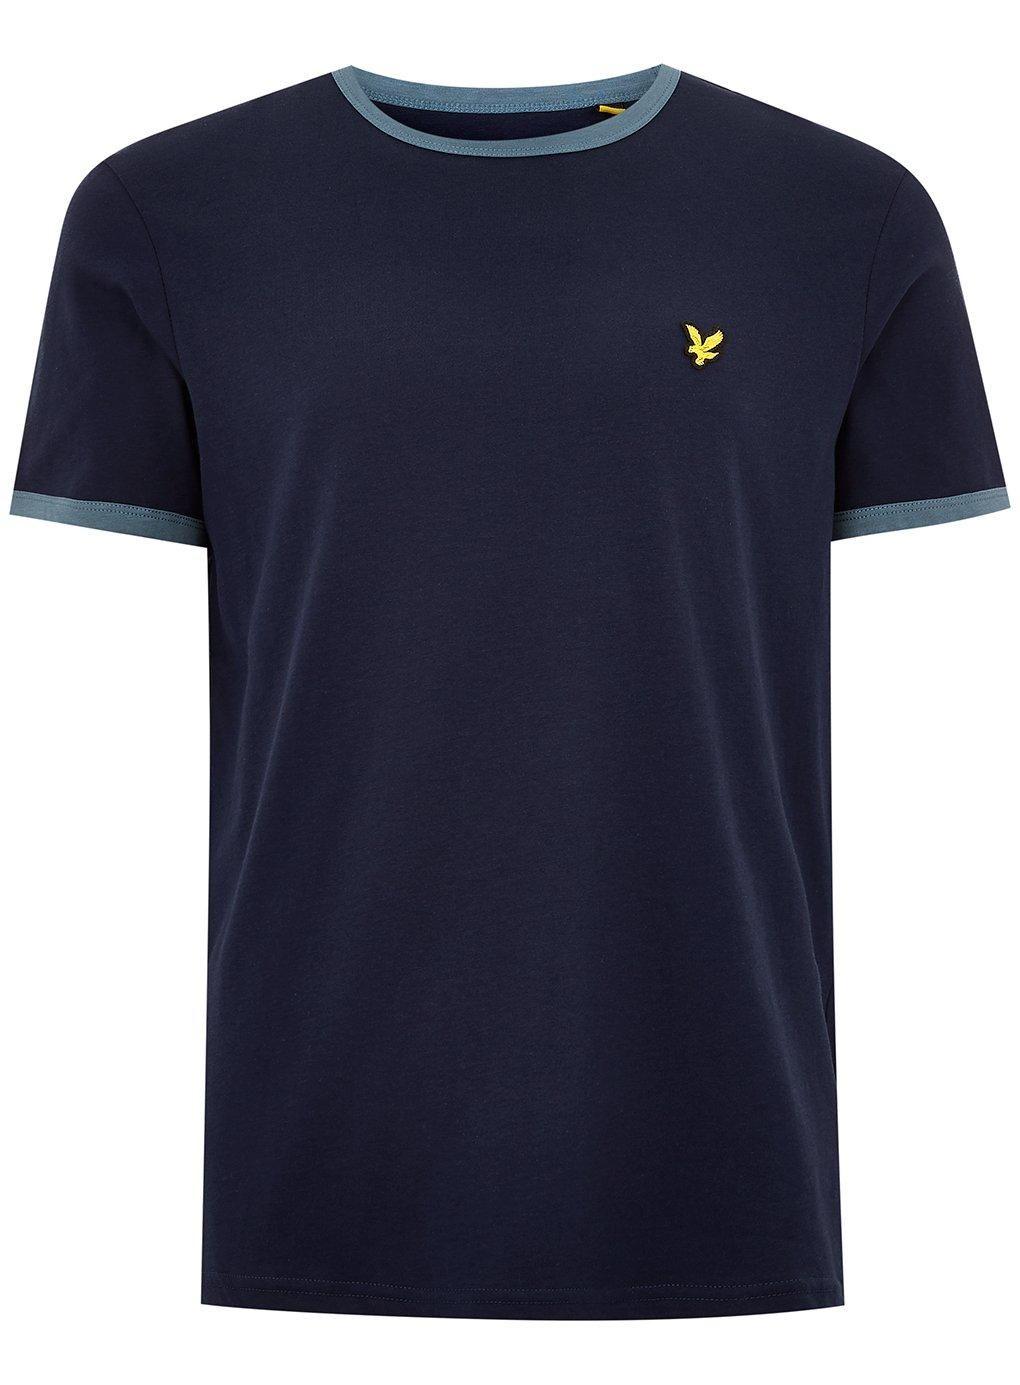 Topman Herren Im Navy Style Oxfordhemd Blau Navyblau Ringer rrFv7x